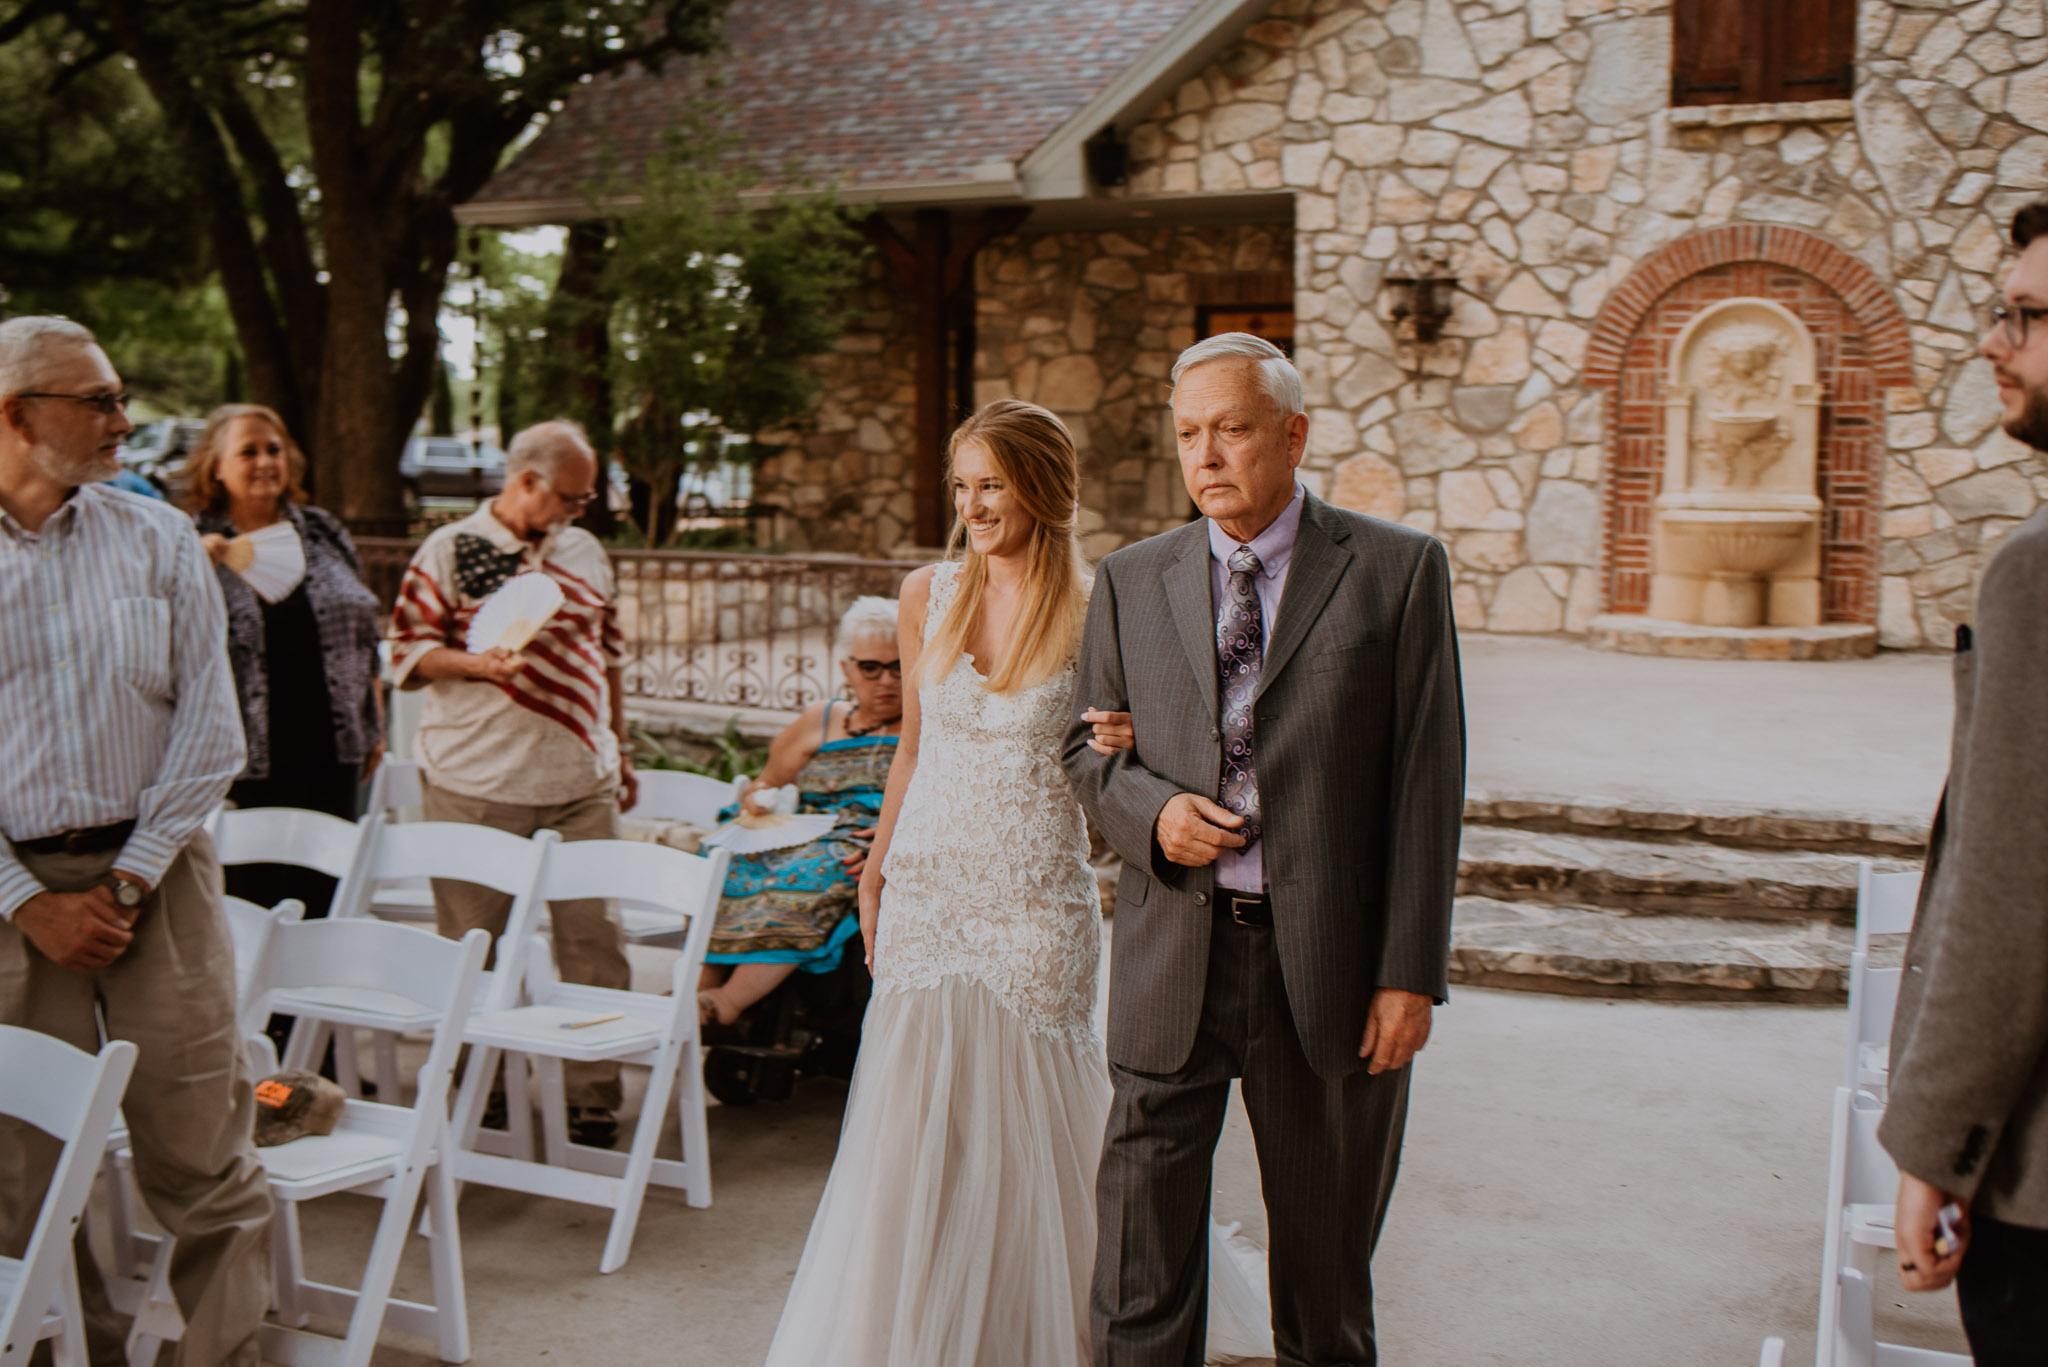 Christoval-vineyard-wedding-heather-justin-0018.jpg